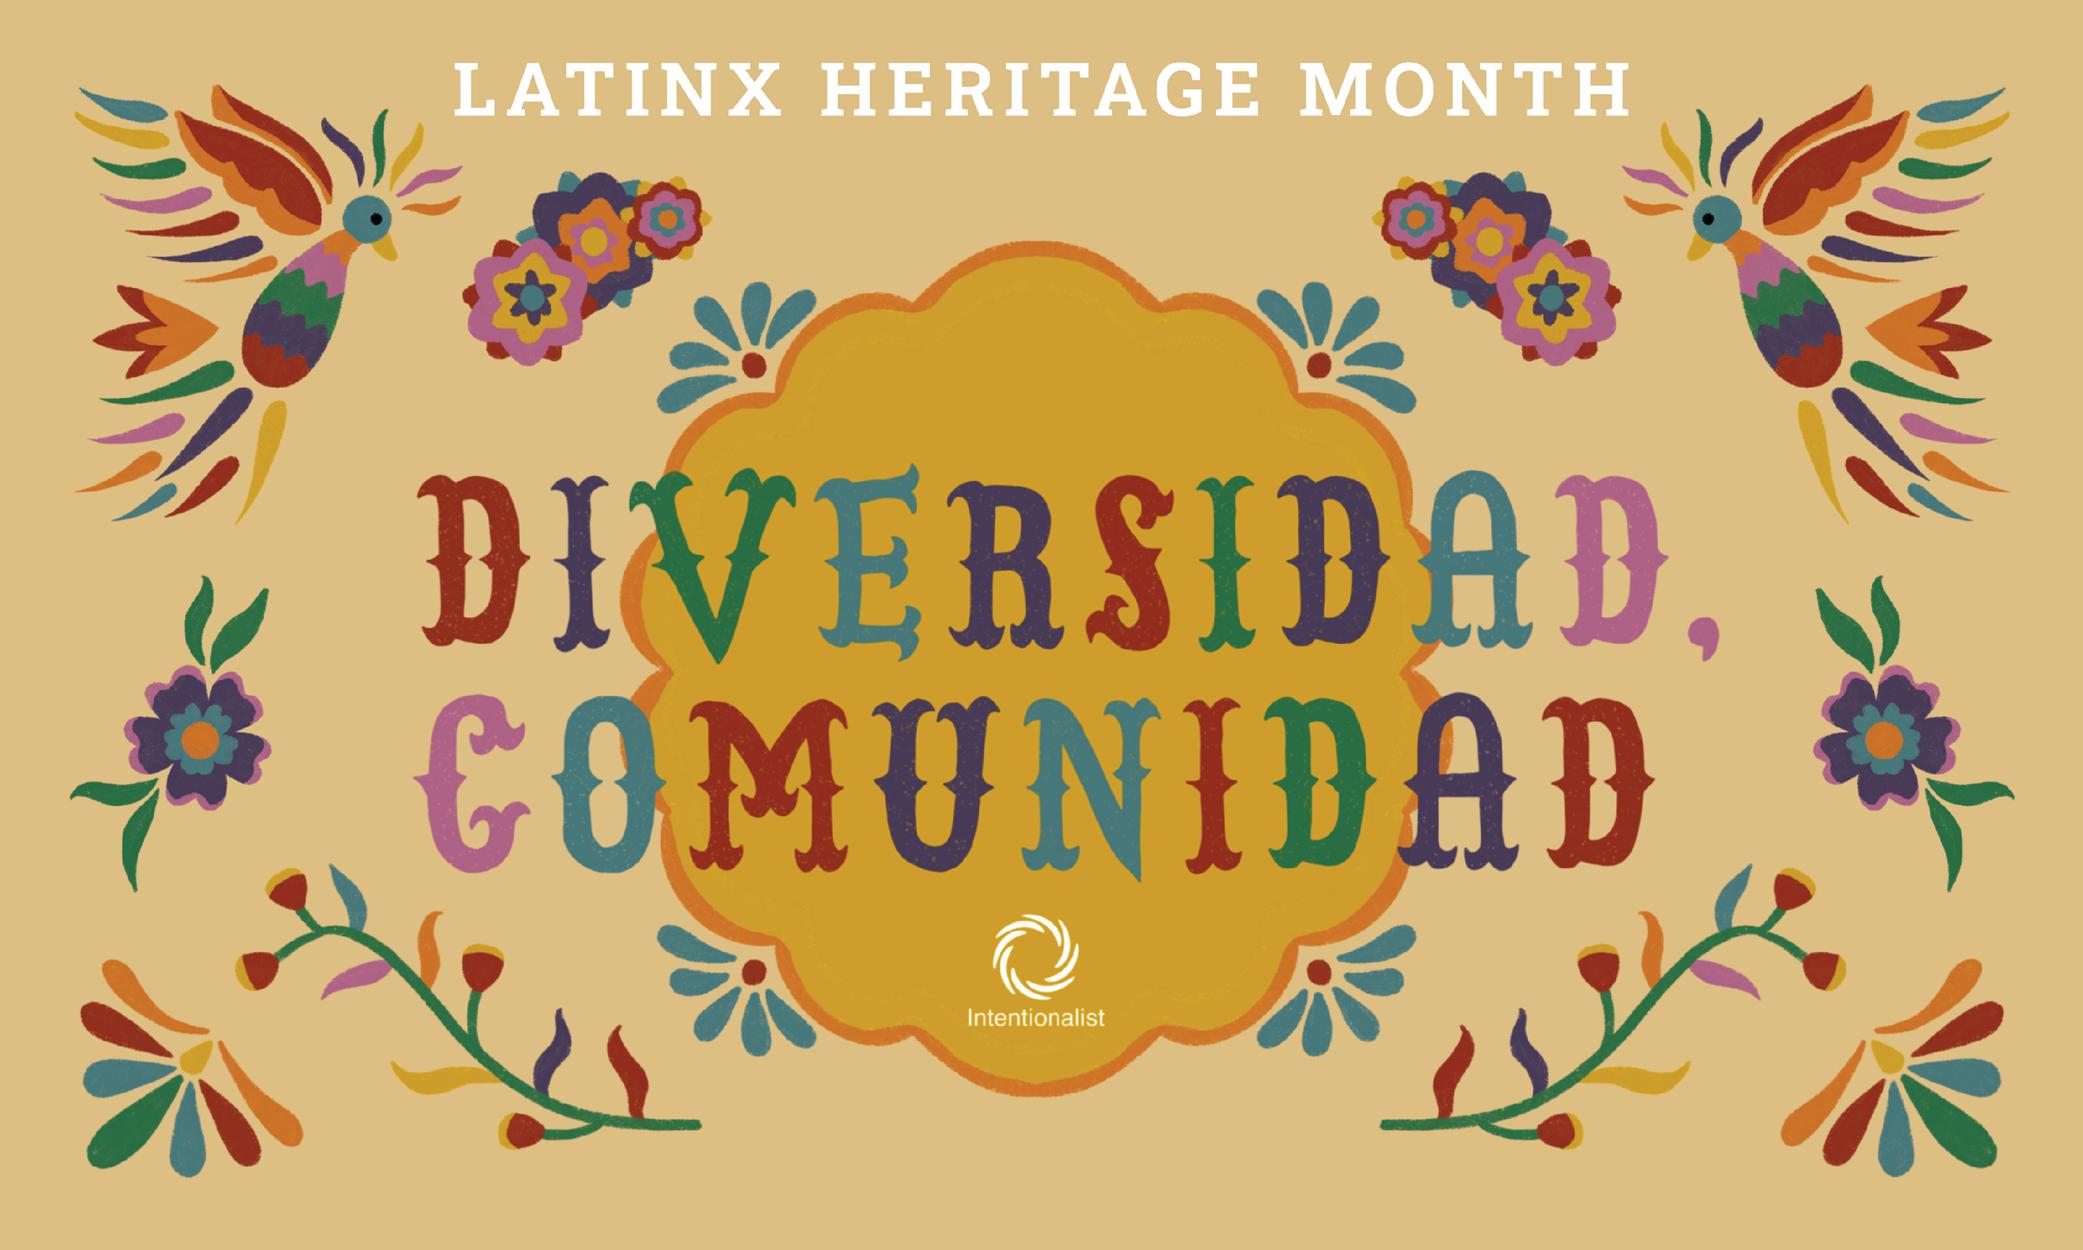 Latinx Heritage Month: Diversidad, Communidad